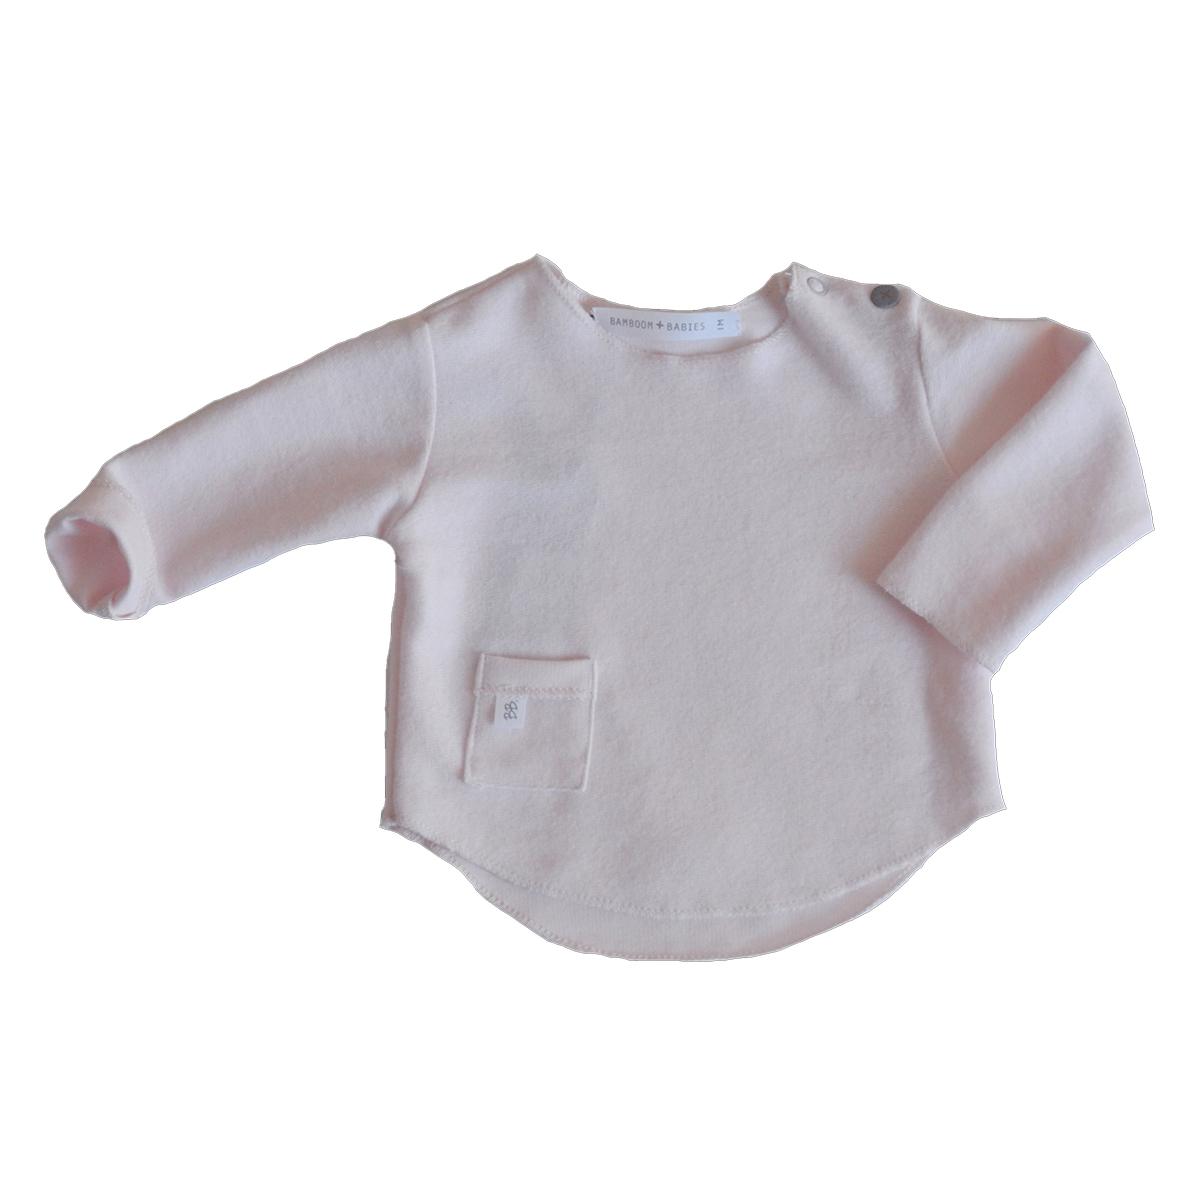 Haut bébé Tee-Shirt Manches Longues Rose - 6 Mois Tee-Shirt Manches Longues Rose - 6 Mois